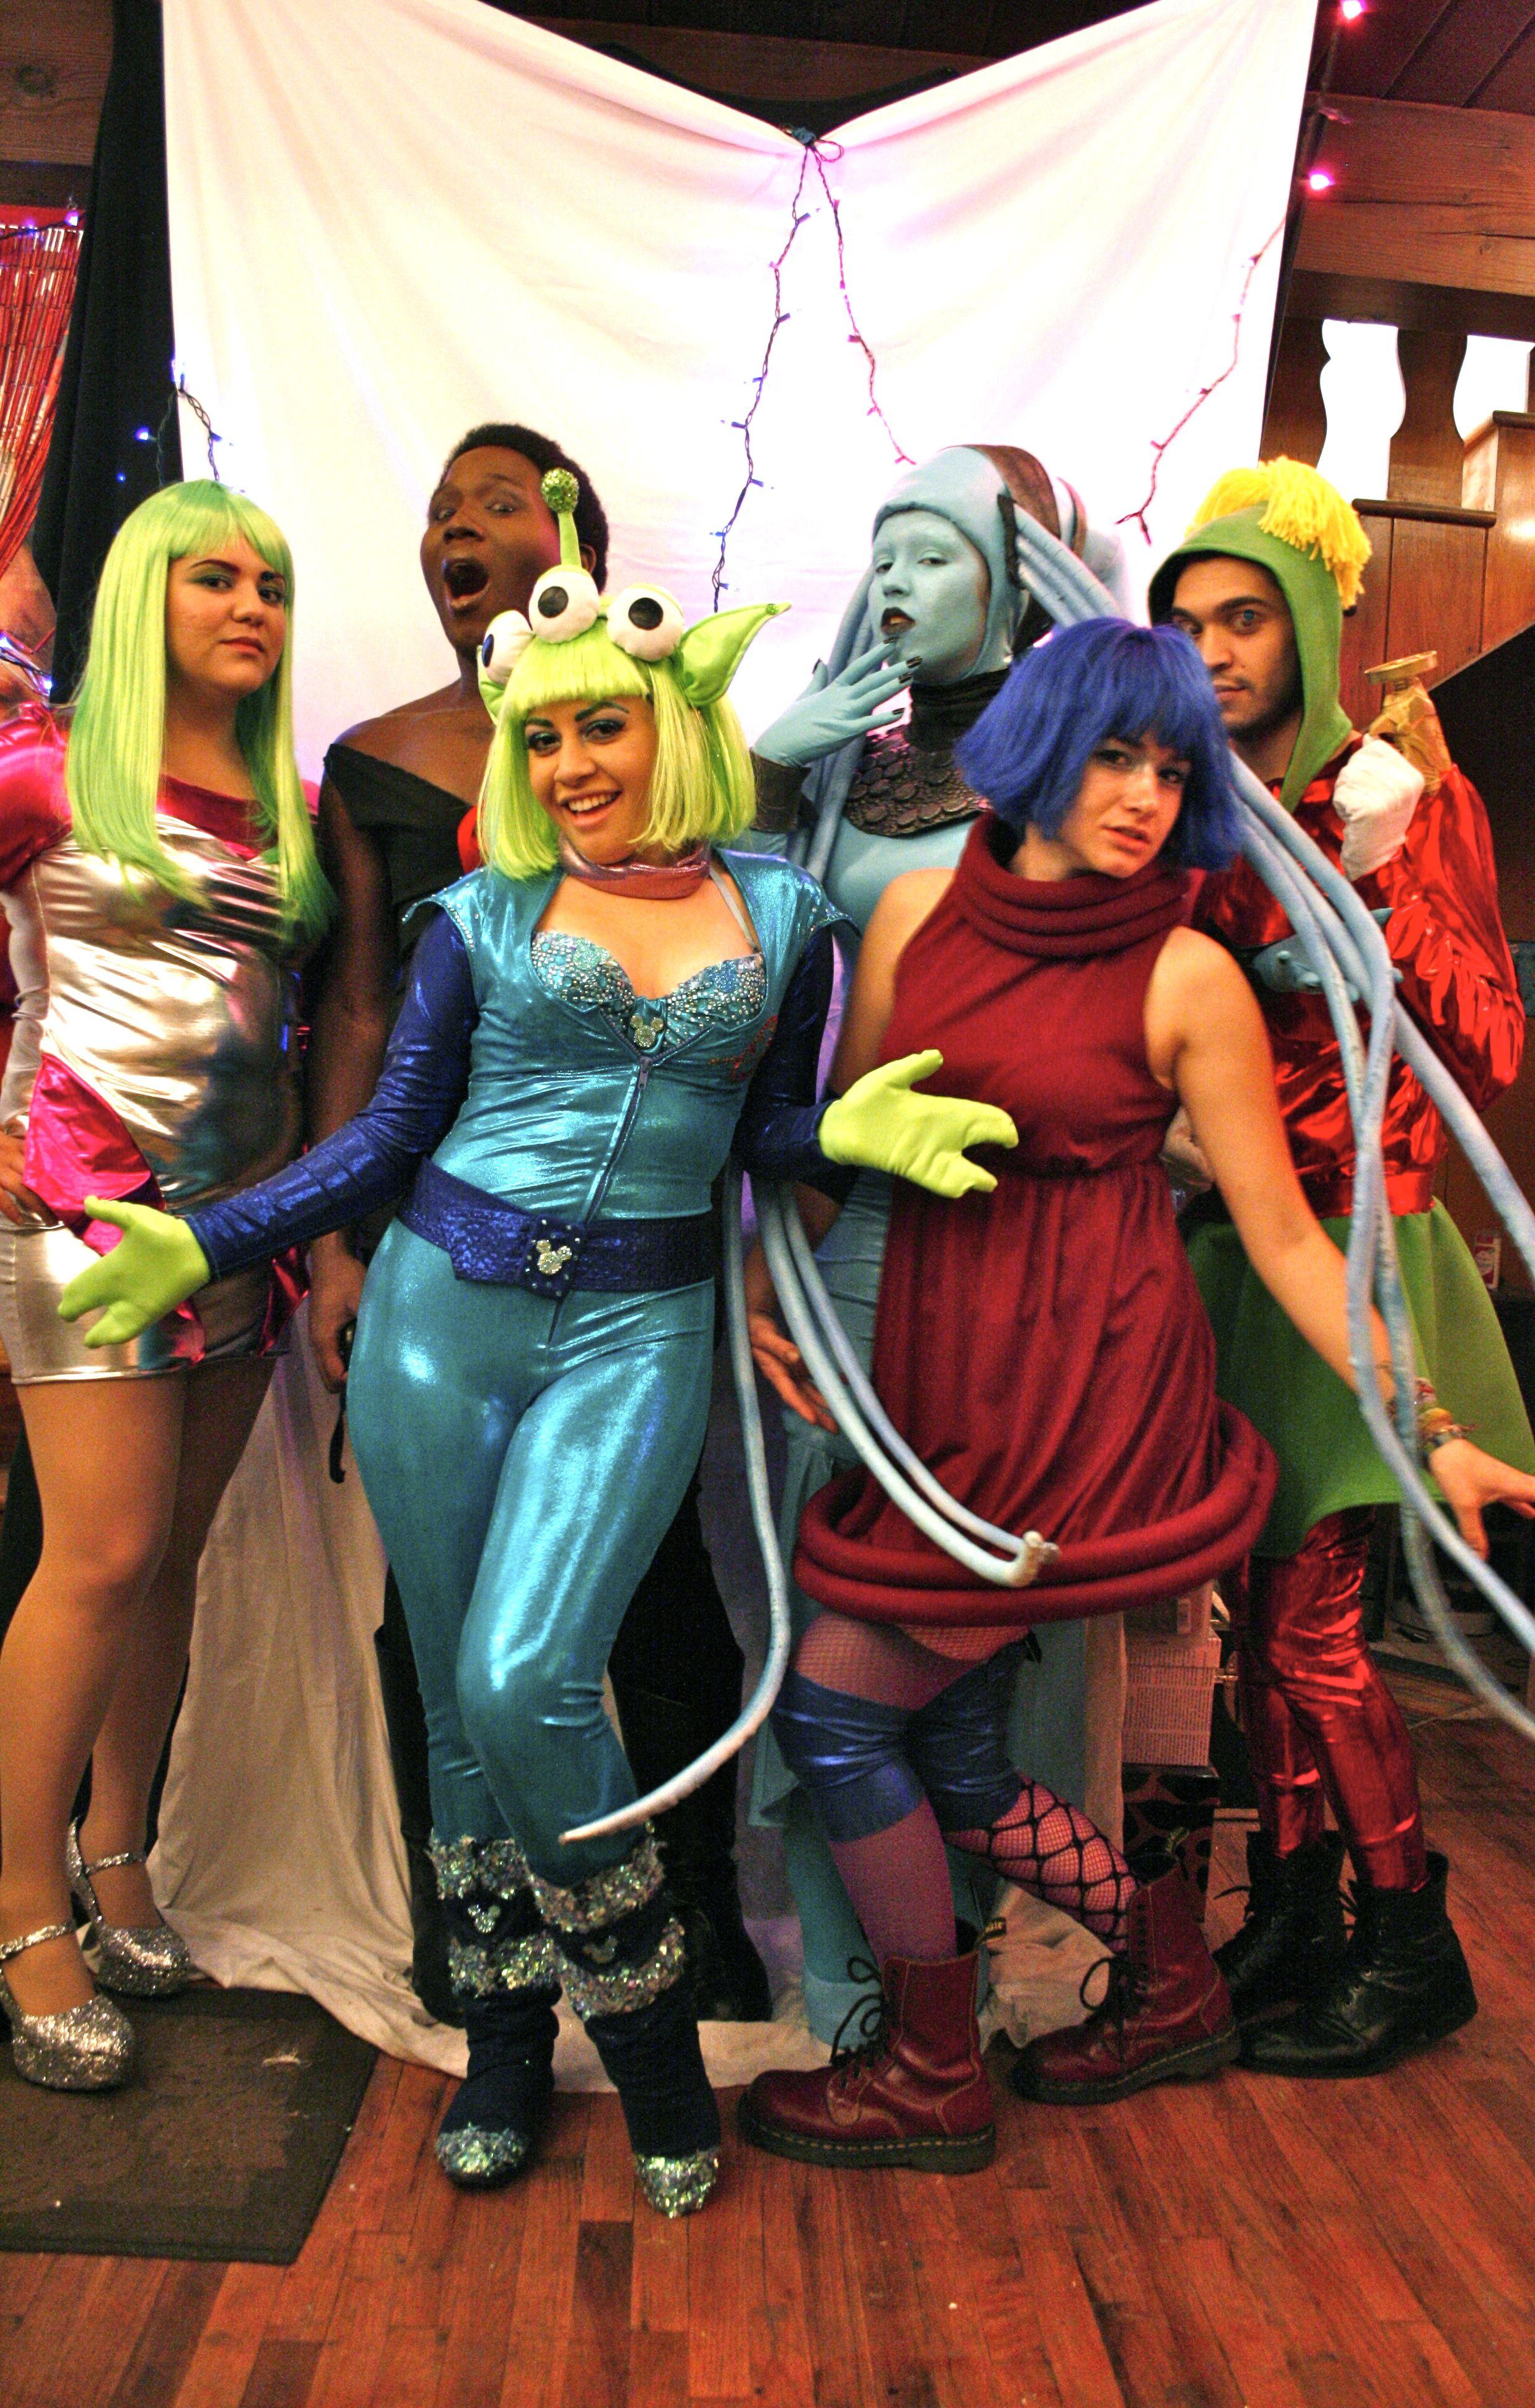 An Intergalactic Costume Ball. Costume Ideas